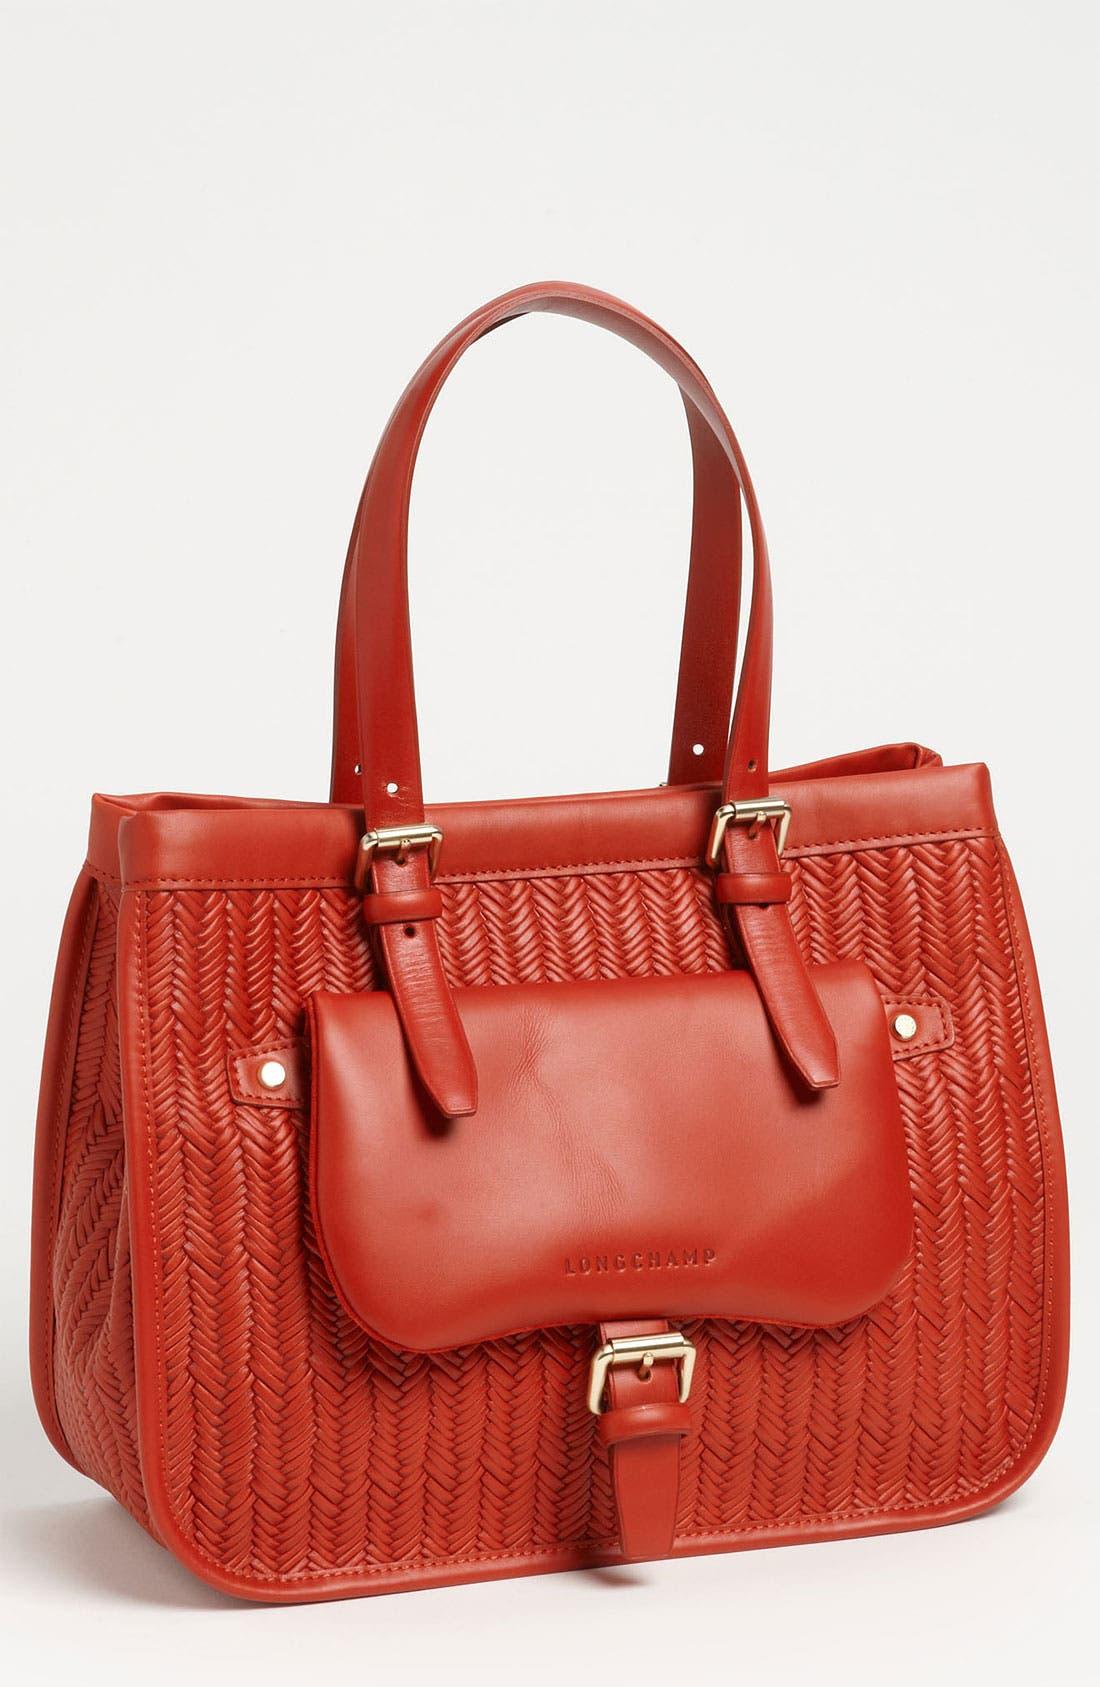 Alternate Image 1 Selected - Longchamp 'Balzane Paille' Shoulder Tote